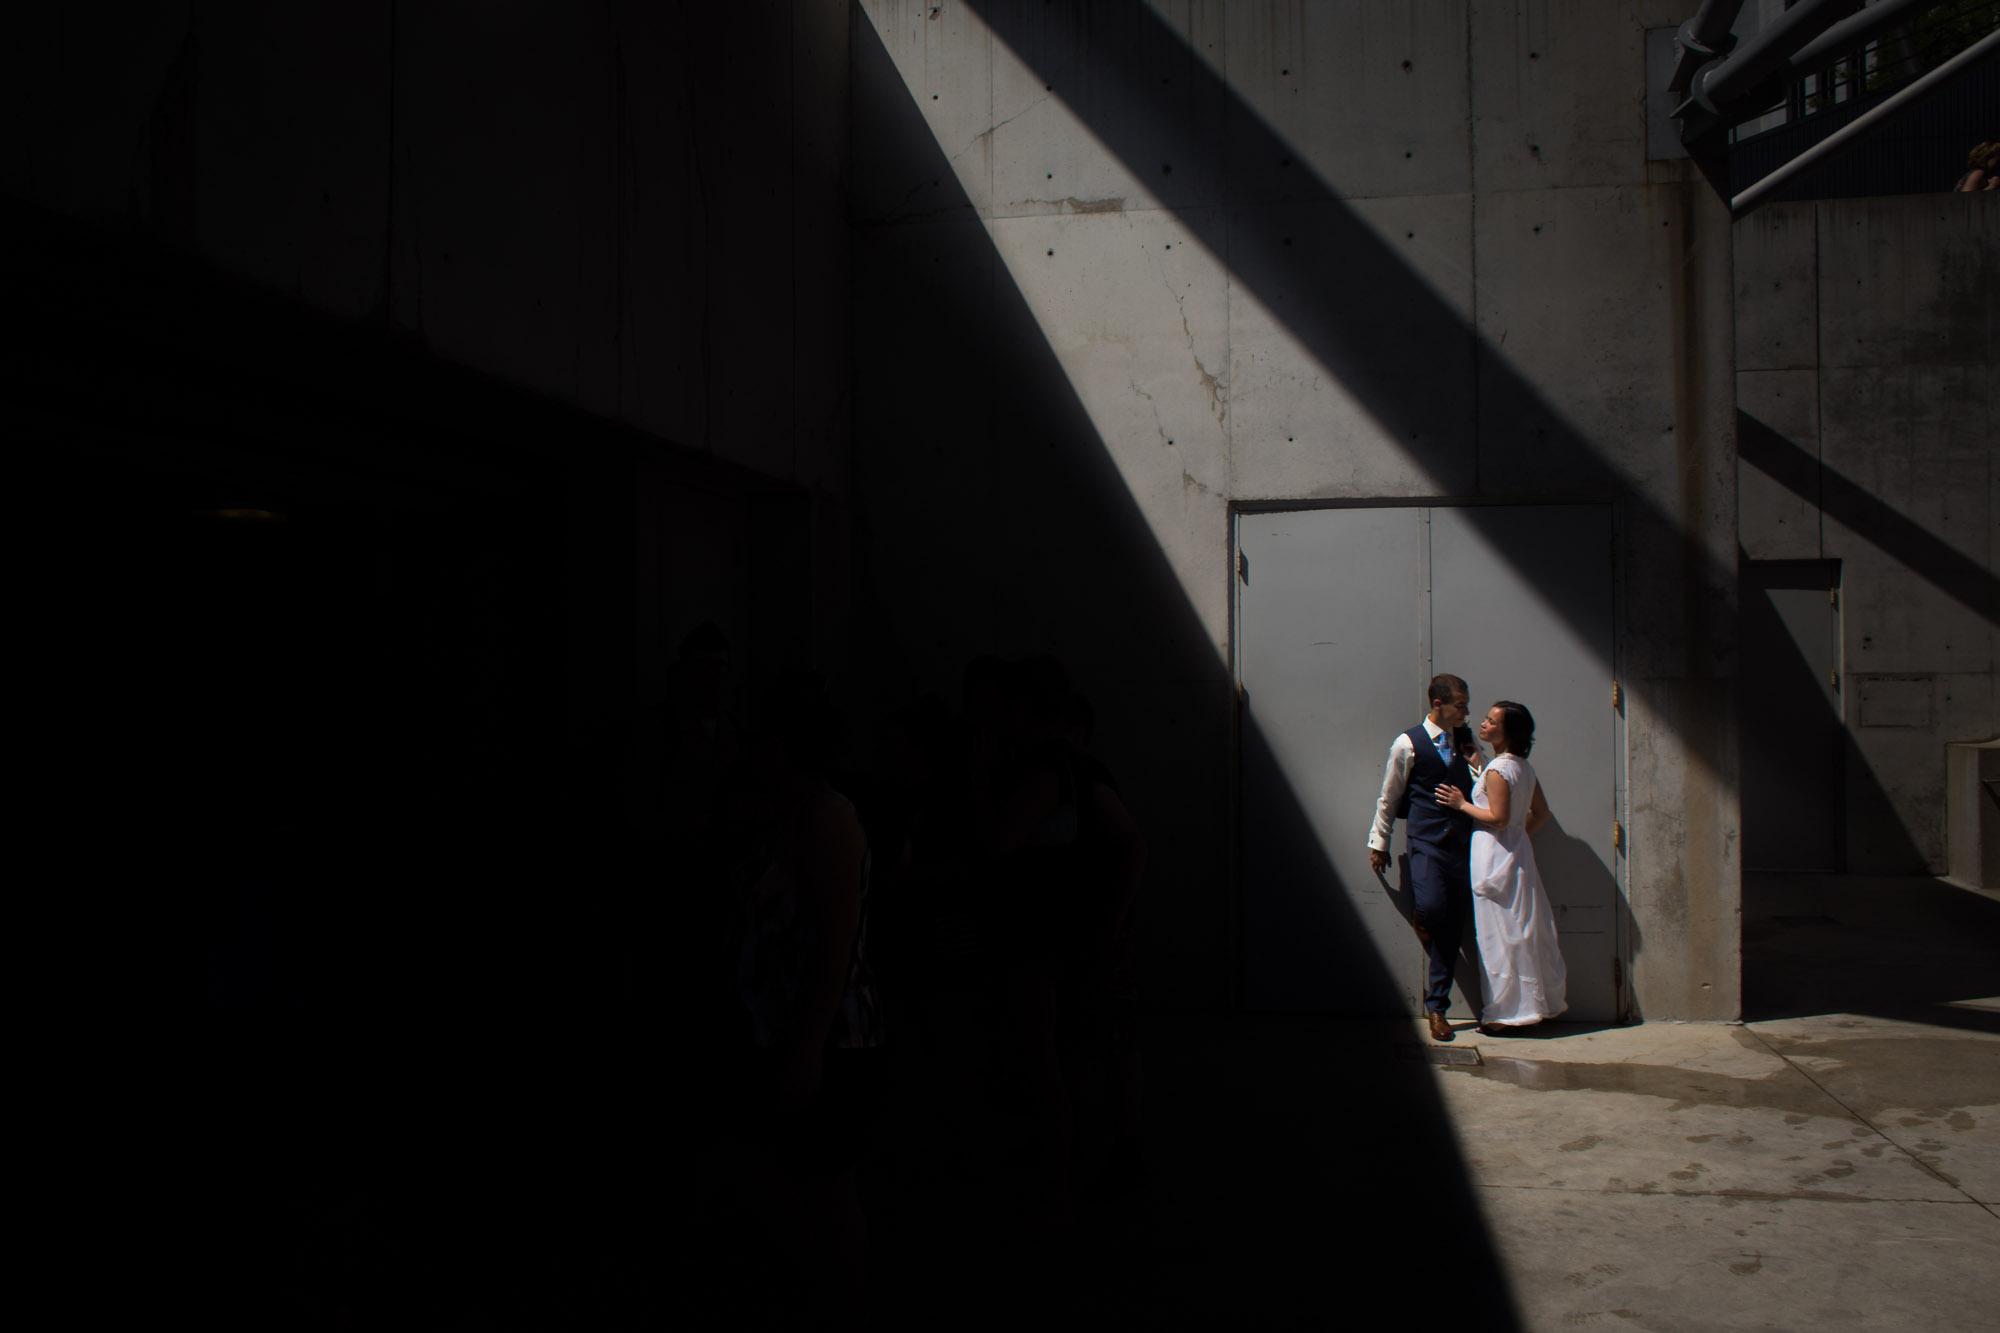 lam-chicago-wedding-photos-29.jpg